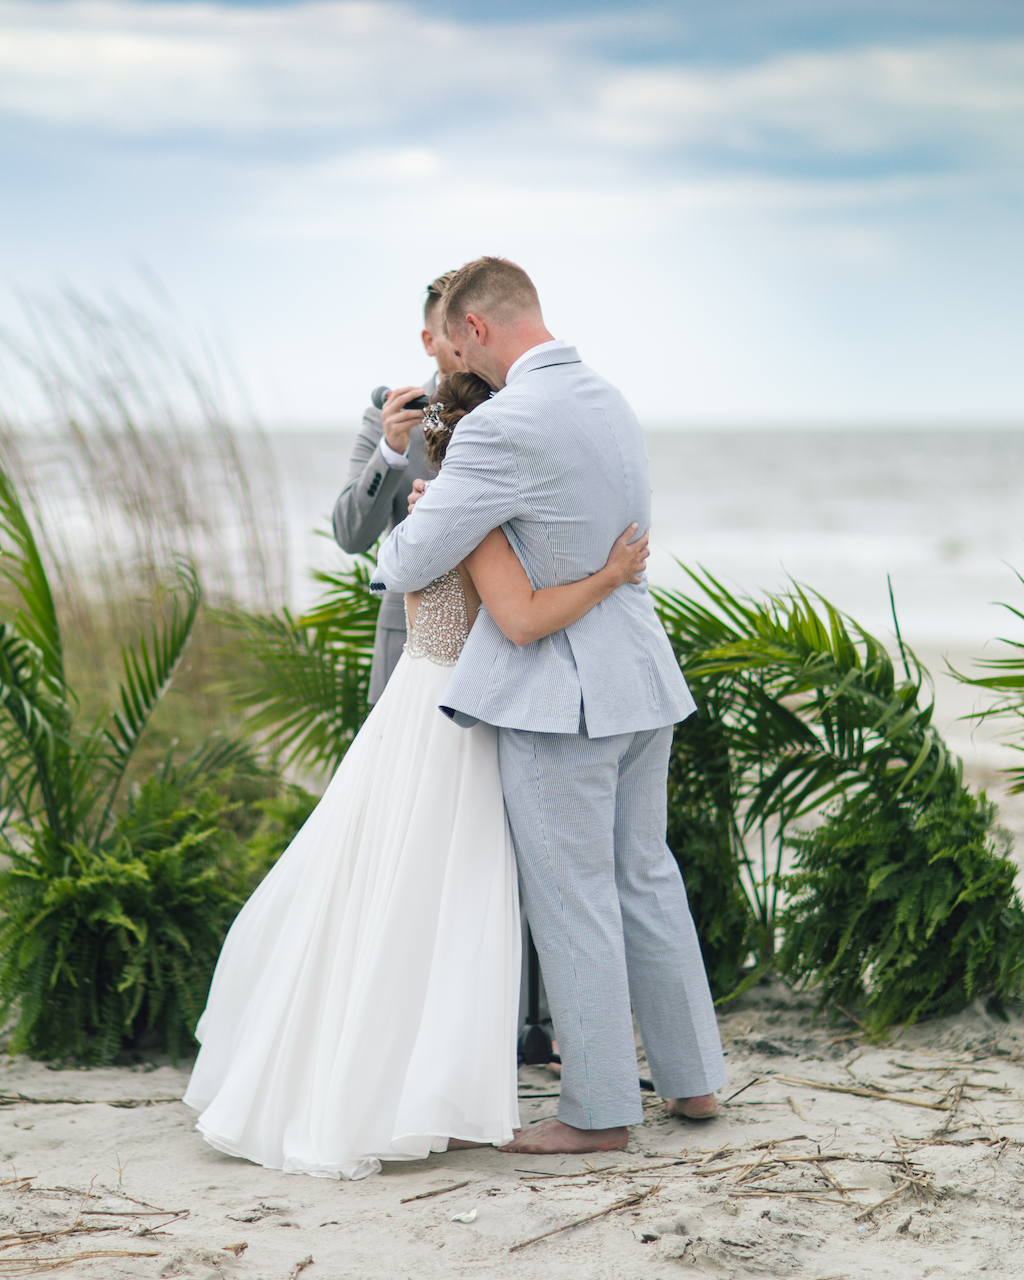 hilton-head-island-wedding-sc-ceremony99.jpg